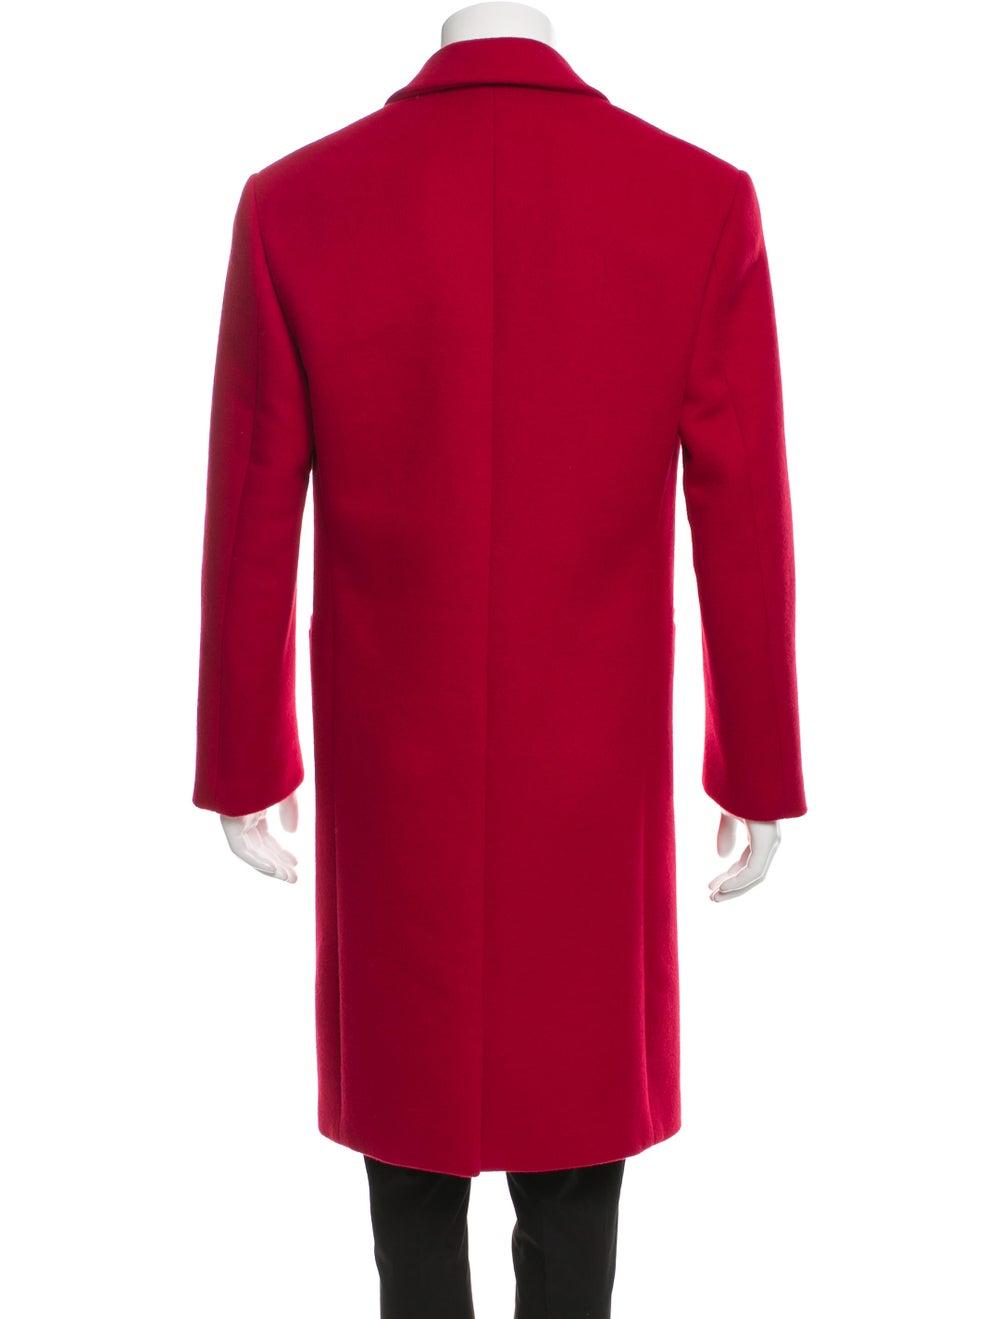 Versace Wool Notch Lapel Overcoat red - image 3